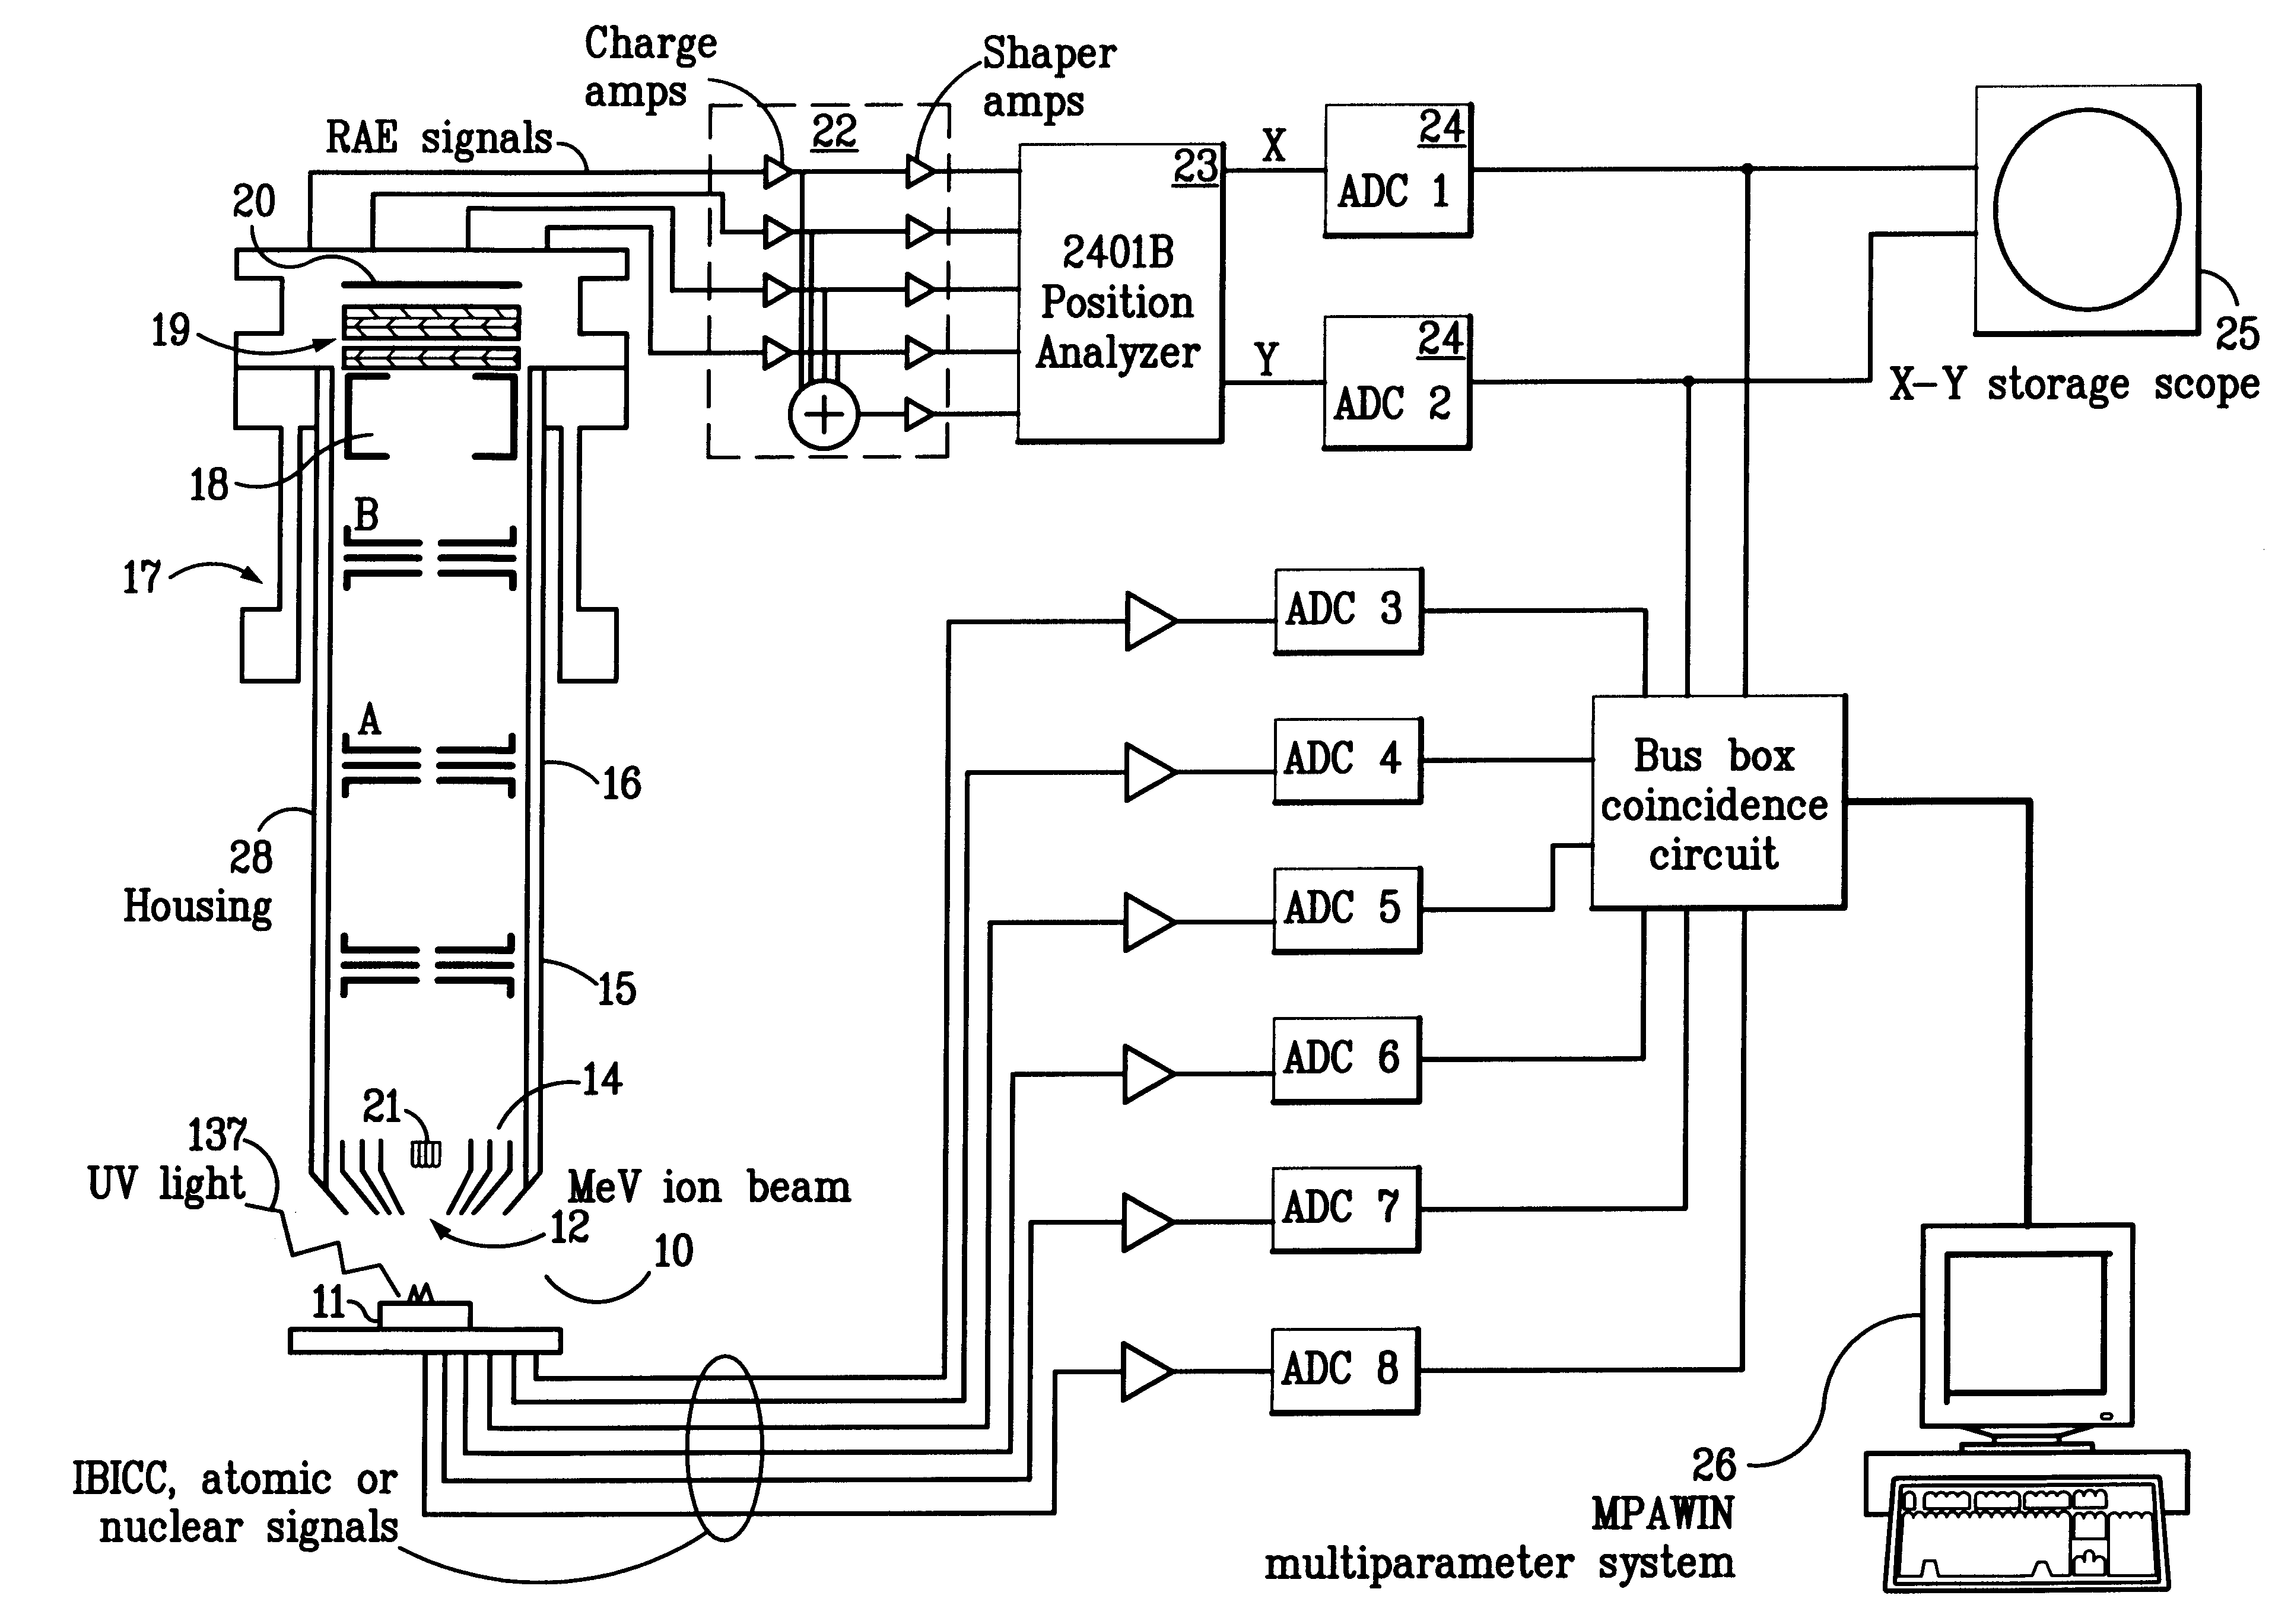 epub VANET Vehicular Applications